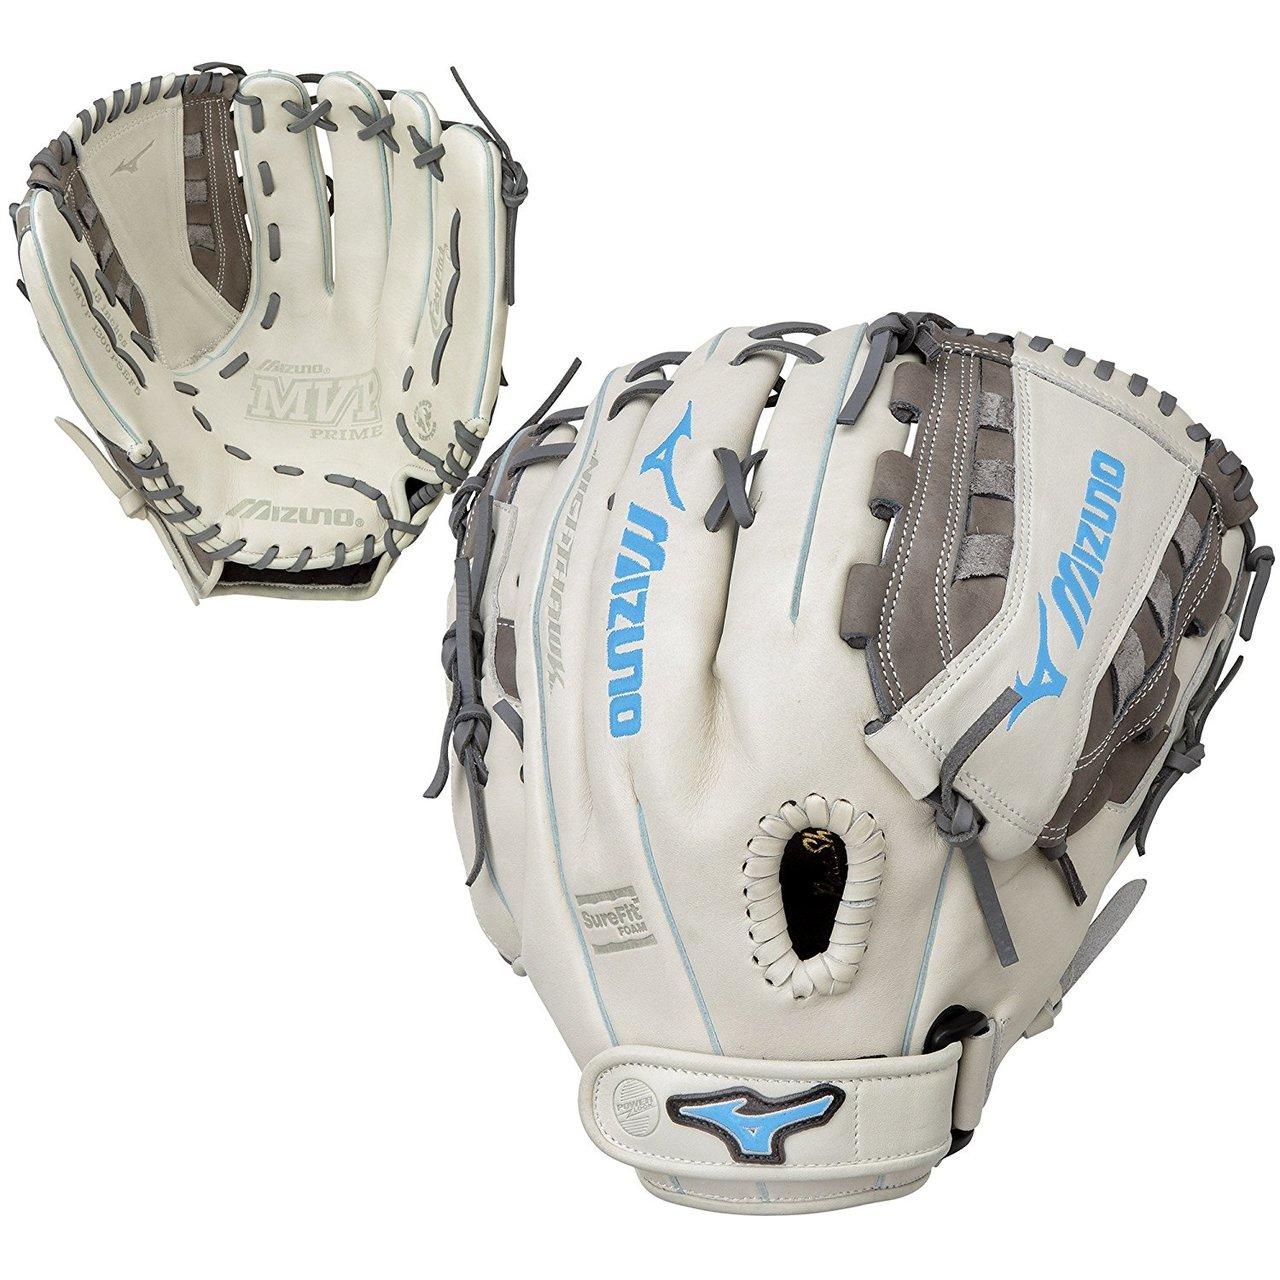 mizuno-mvp-prime-se-13-inch-gmvp1300psef5-fastpitch-softball-glove-silver-black-right-hand-throw GMVP1300PSEF5-SIBK-RightHandThrow Mizuno 889961059865 The MVP Prime SE fastpitch softball series gloves feature a Center